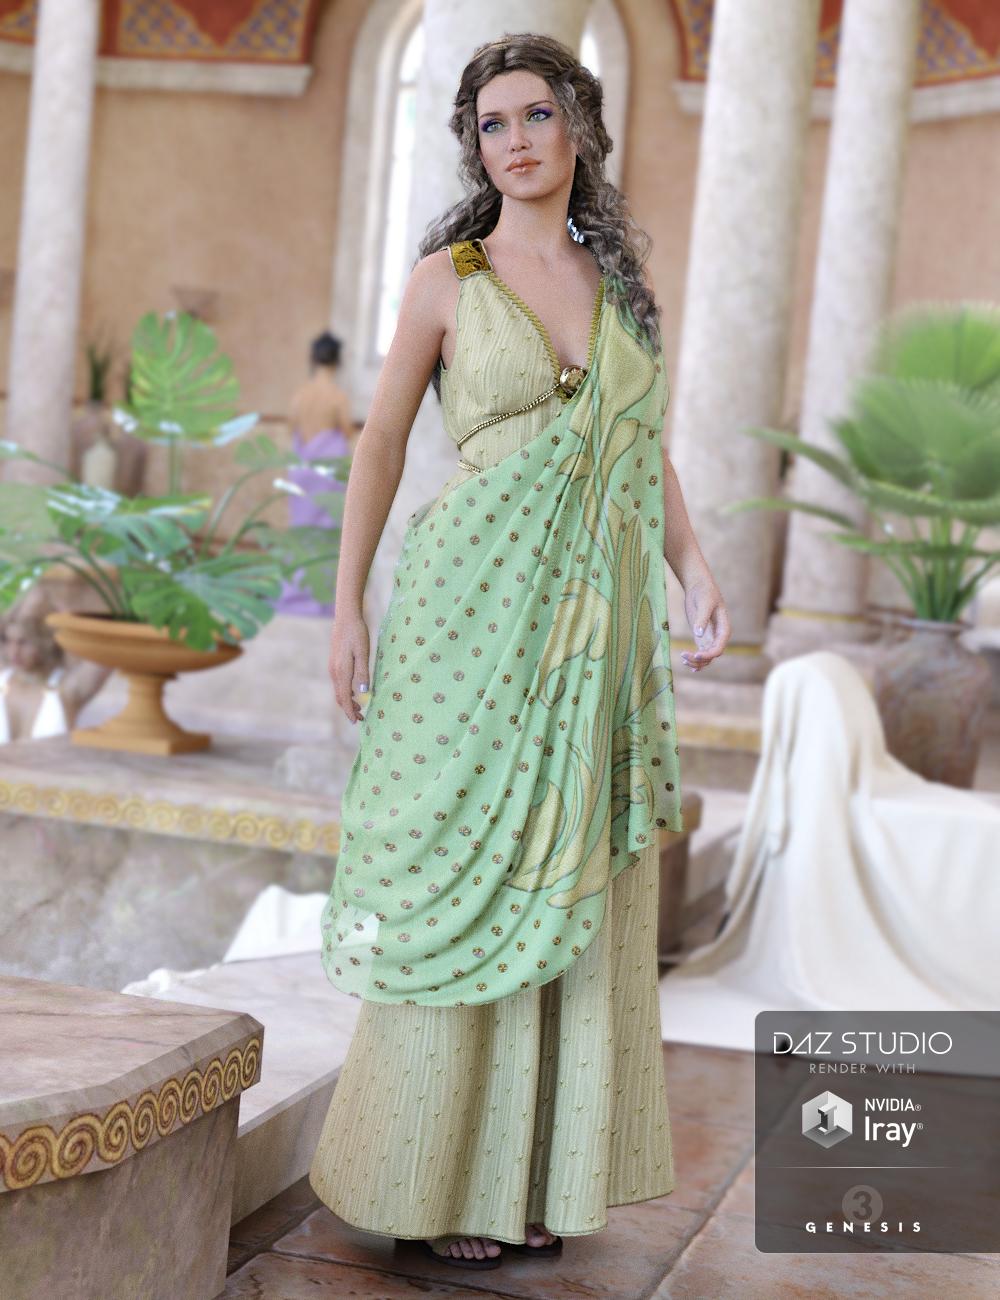 Hellenic for Genesis 3 Female(s) by: Ravenhair, 3D Models by Daz 3D